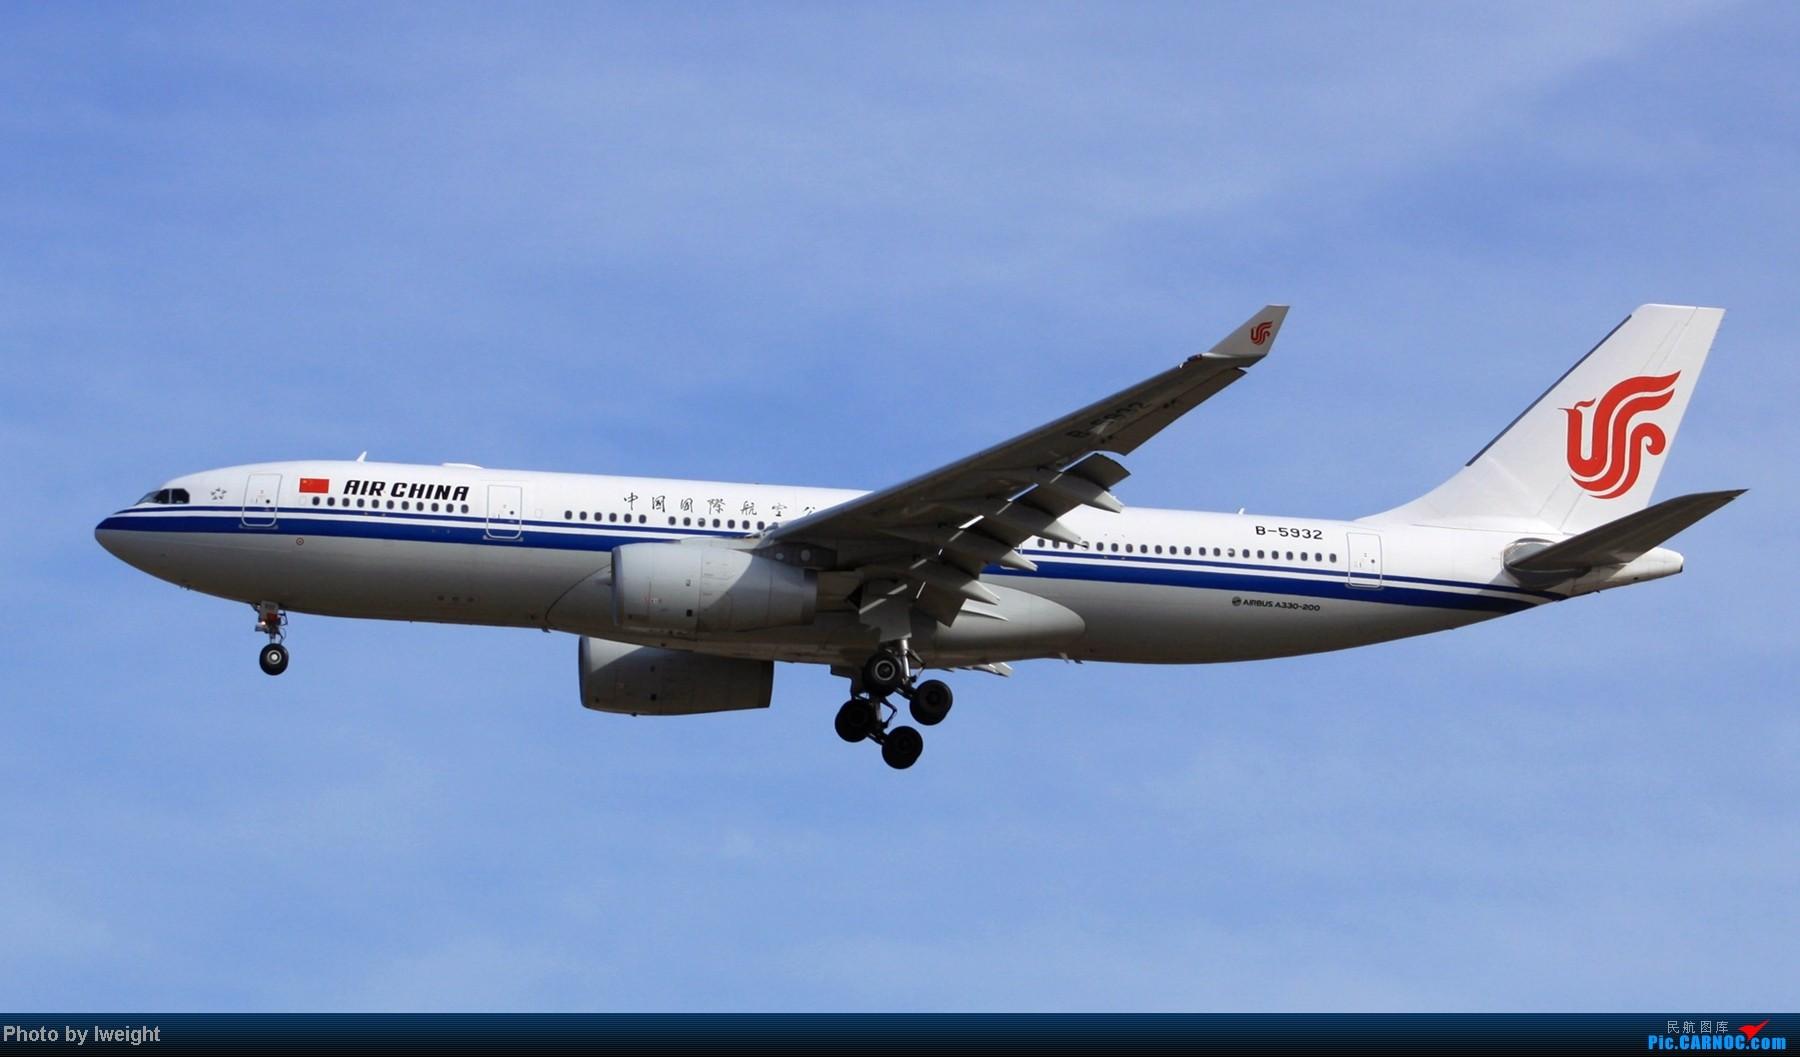 Re:[原创]春节期间首都机场拍机汇报 AIRBUS A330-200 B-5932 中国北京首都机场